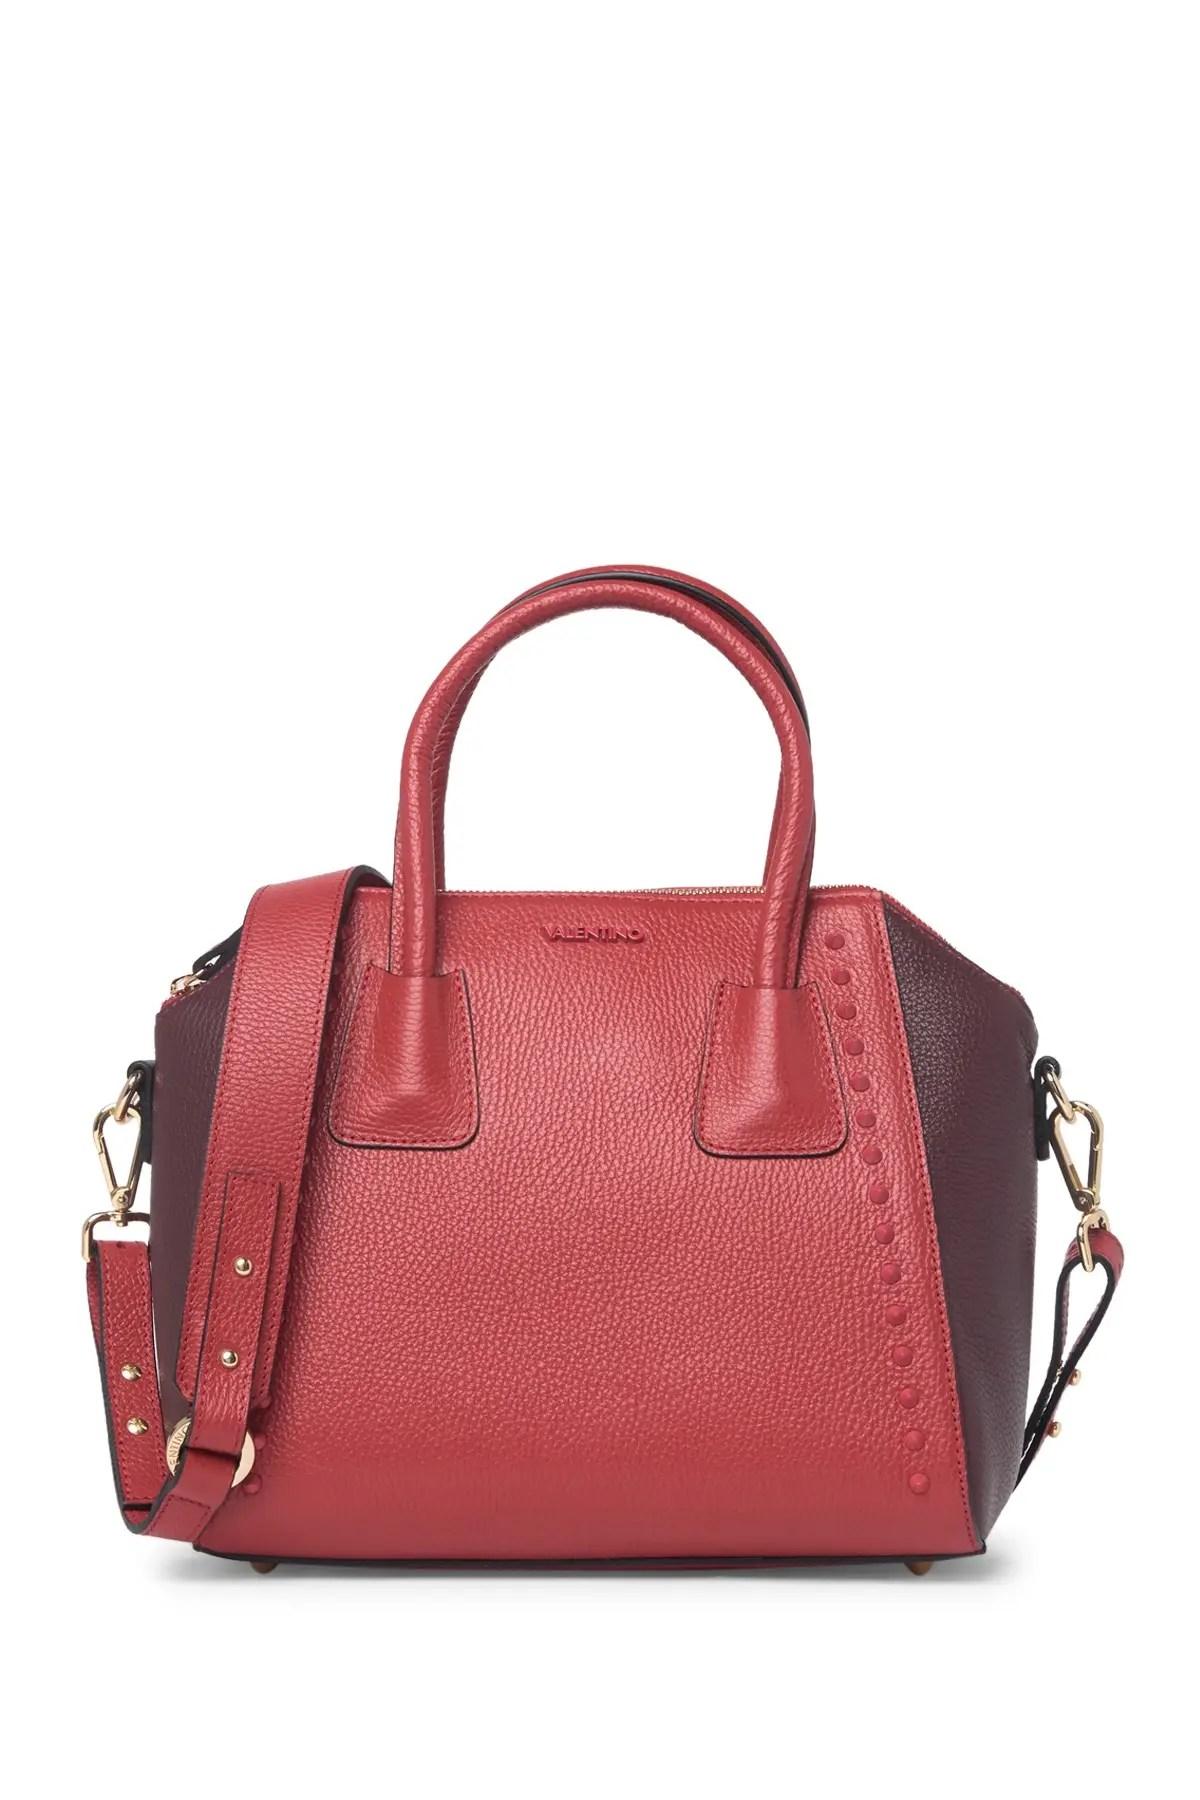 minimi leather satchel